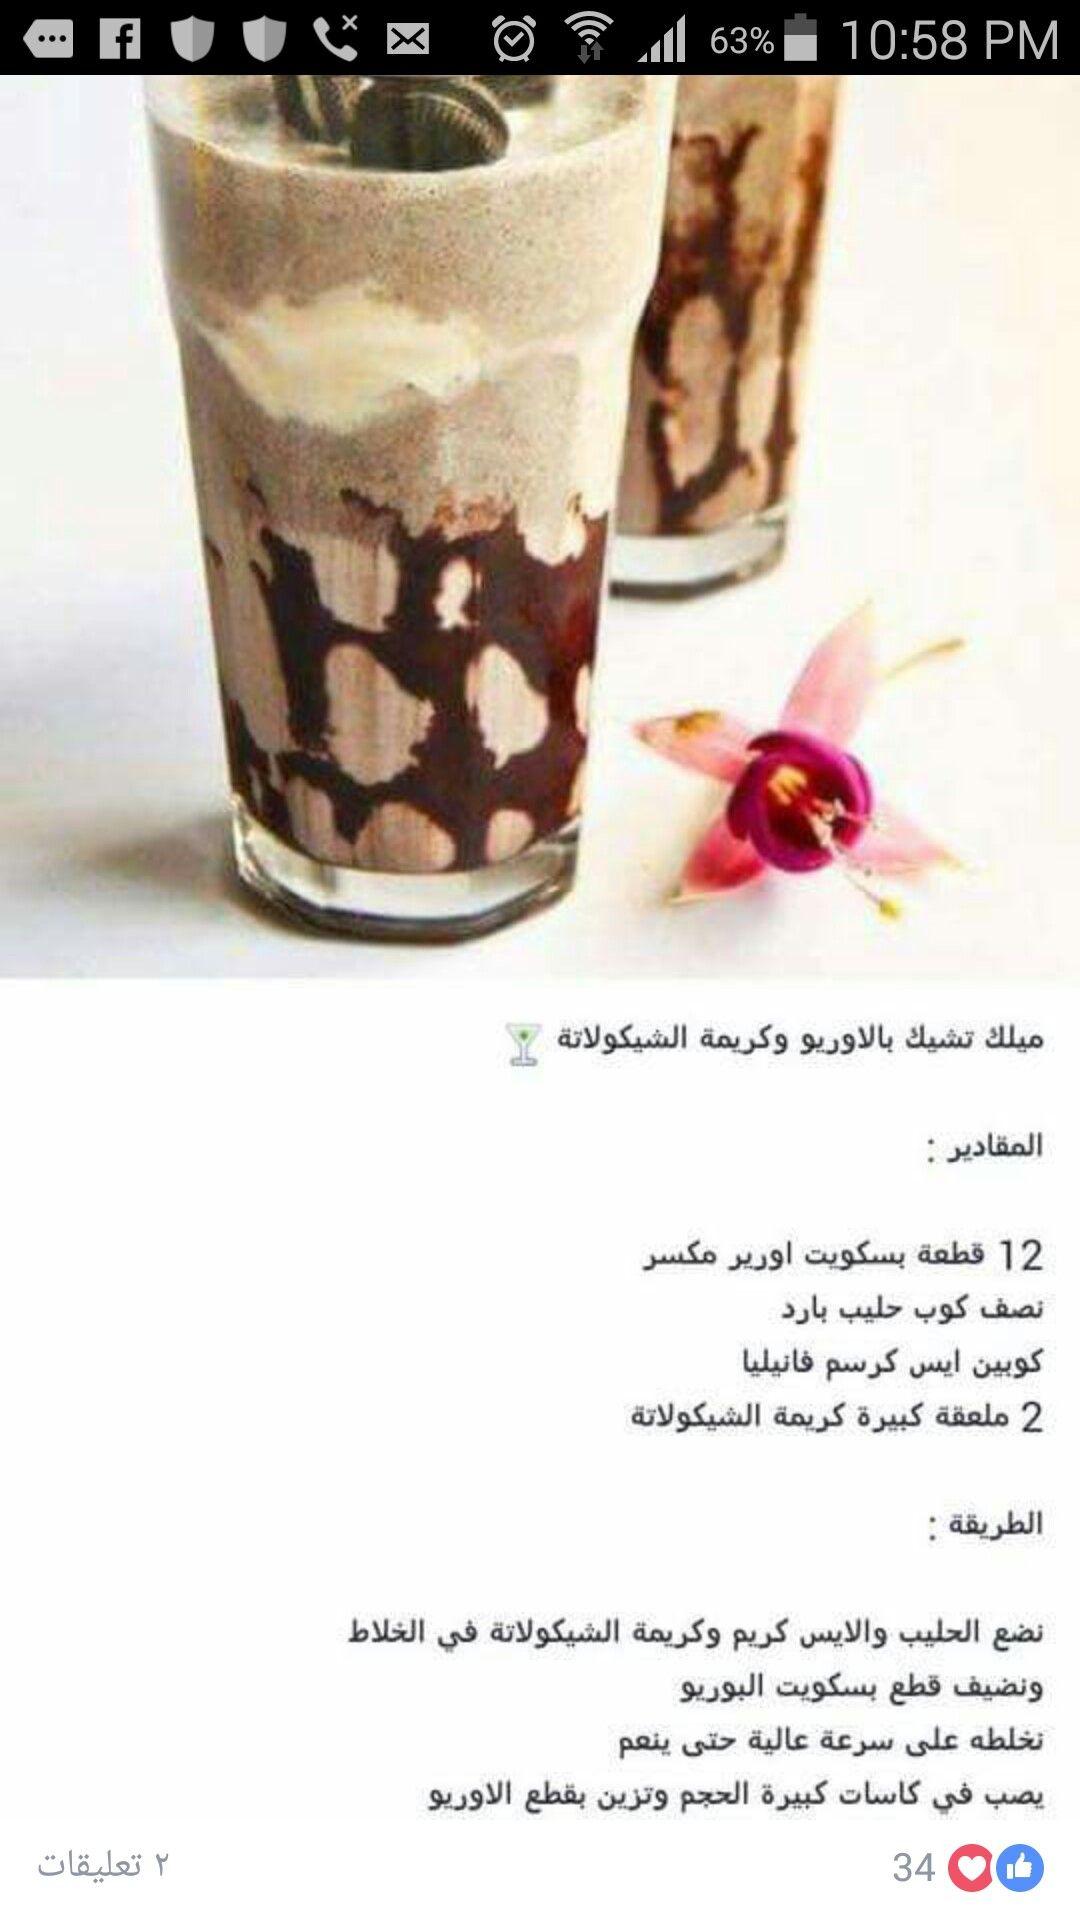 ميلك شيك الاوريو Coffee Drink Recipes Yummy Food Dessert Coffee Recipes